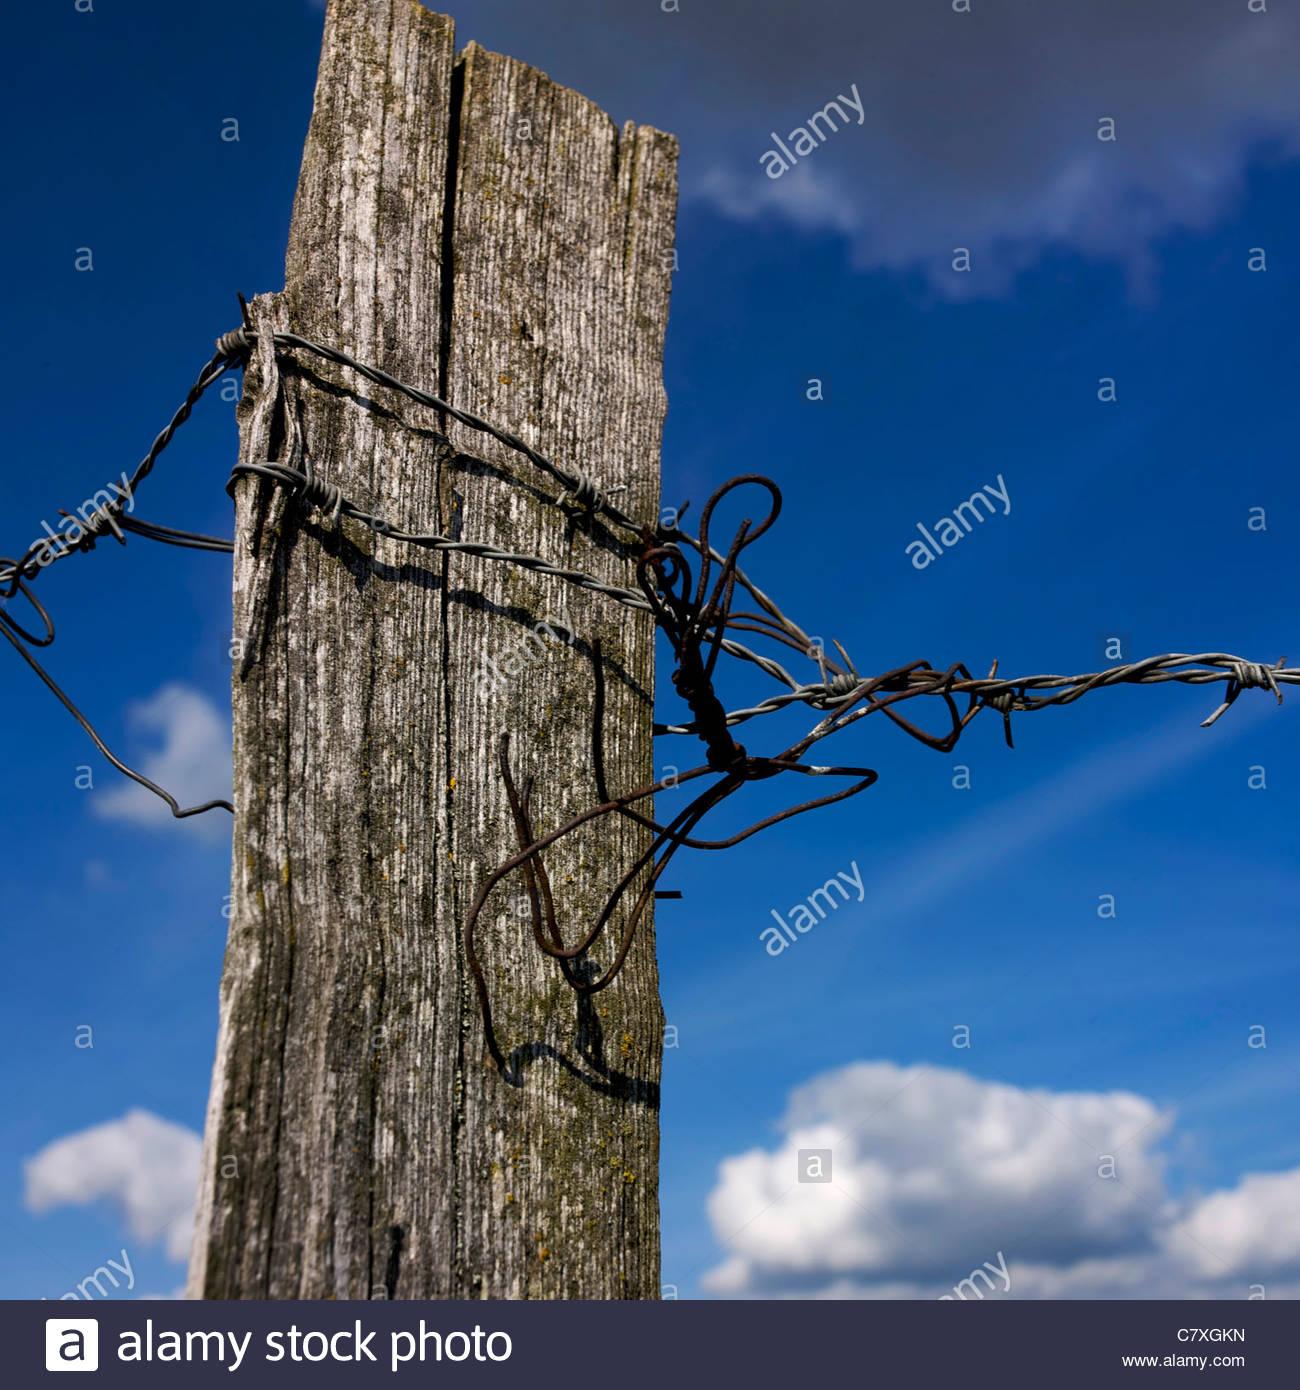 Holz-Zaun mit Stacheldraht verdreht Stockbild